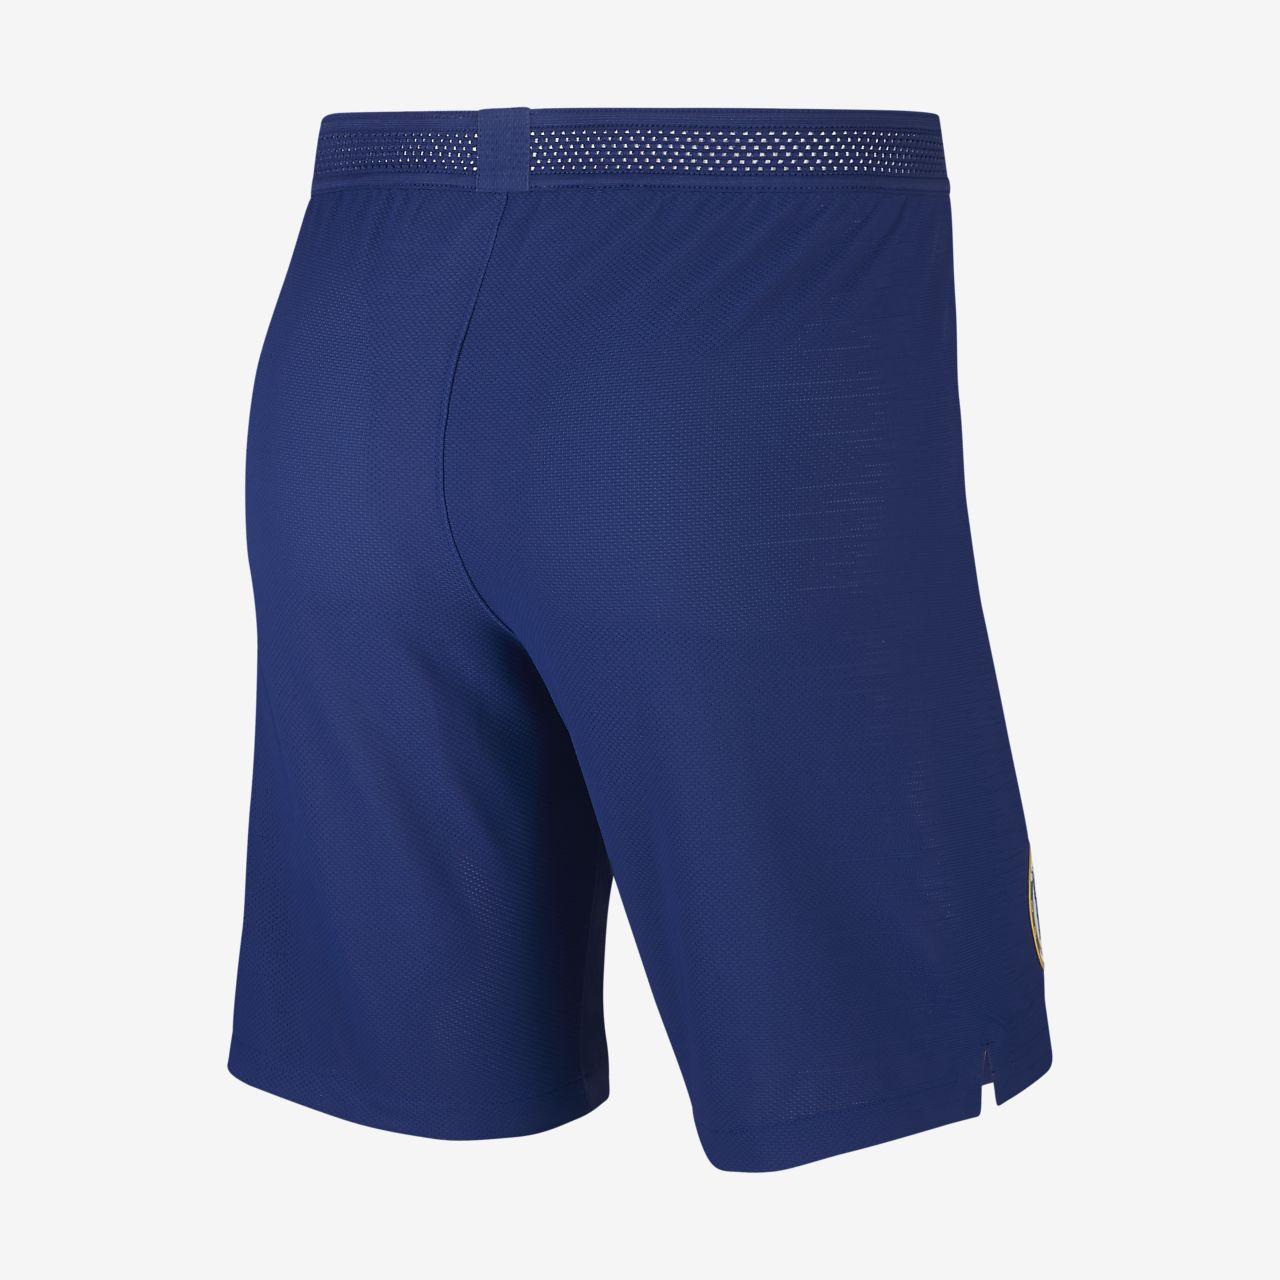 bef4034af38 Chelsea FC 2019/20 Vapor Match Home/Away Men's Football Shorts. Nike ...